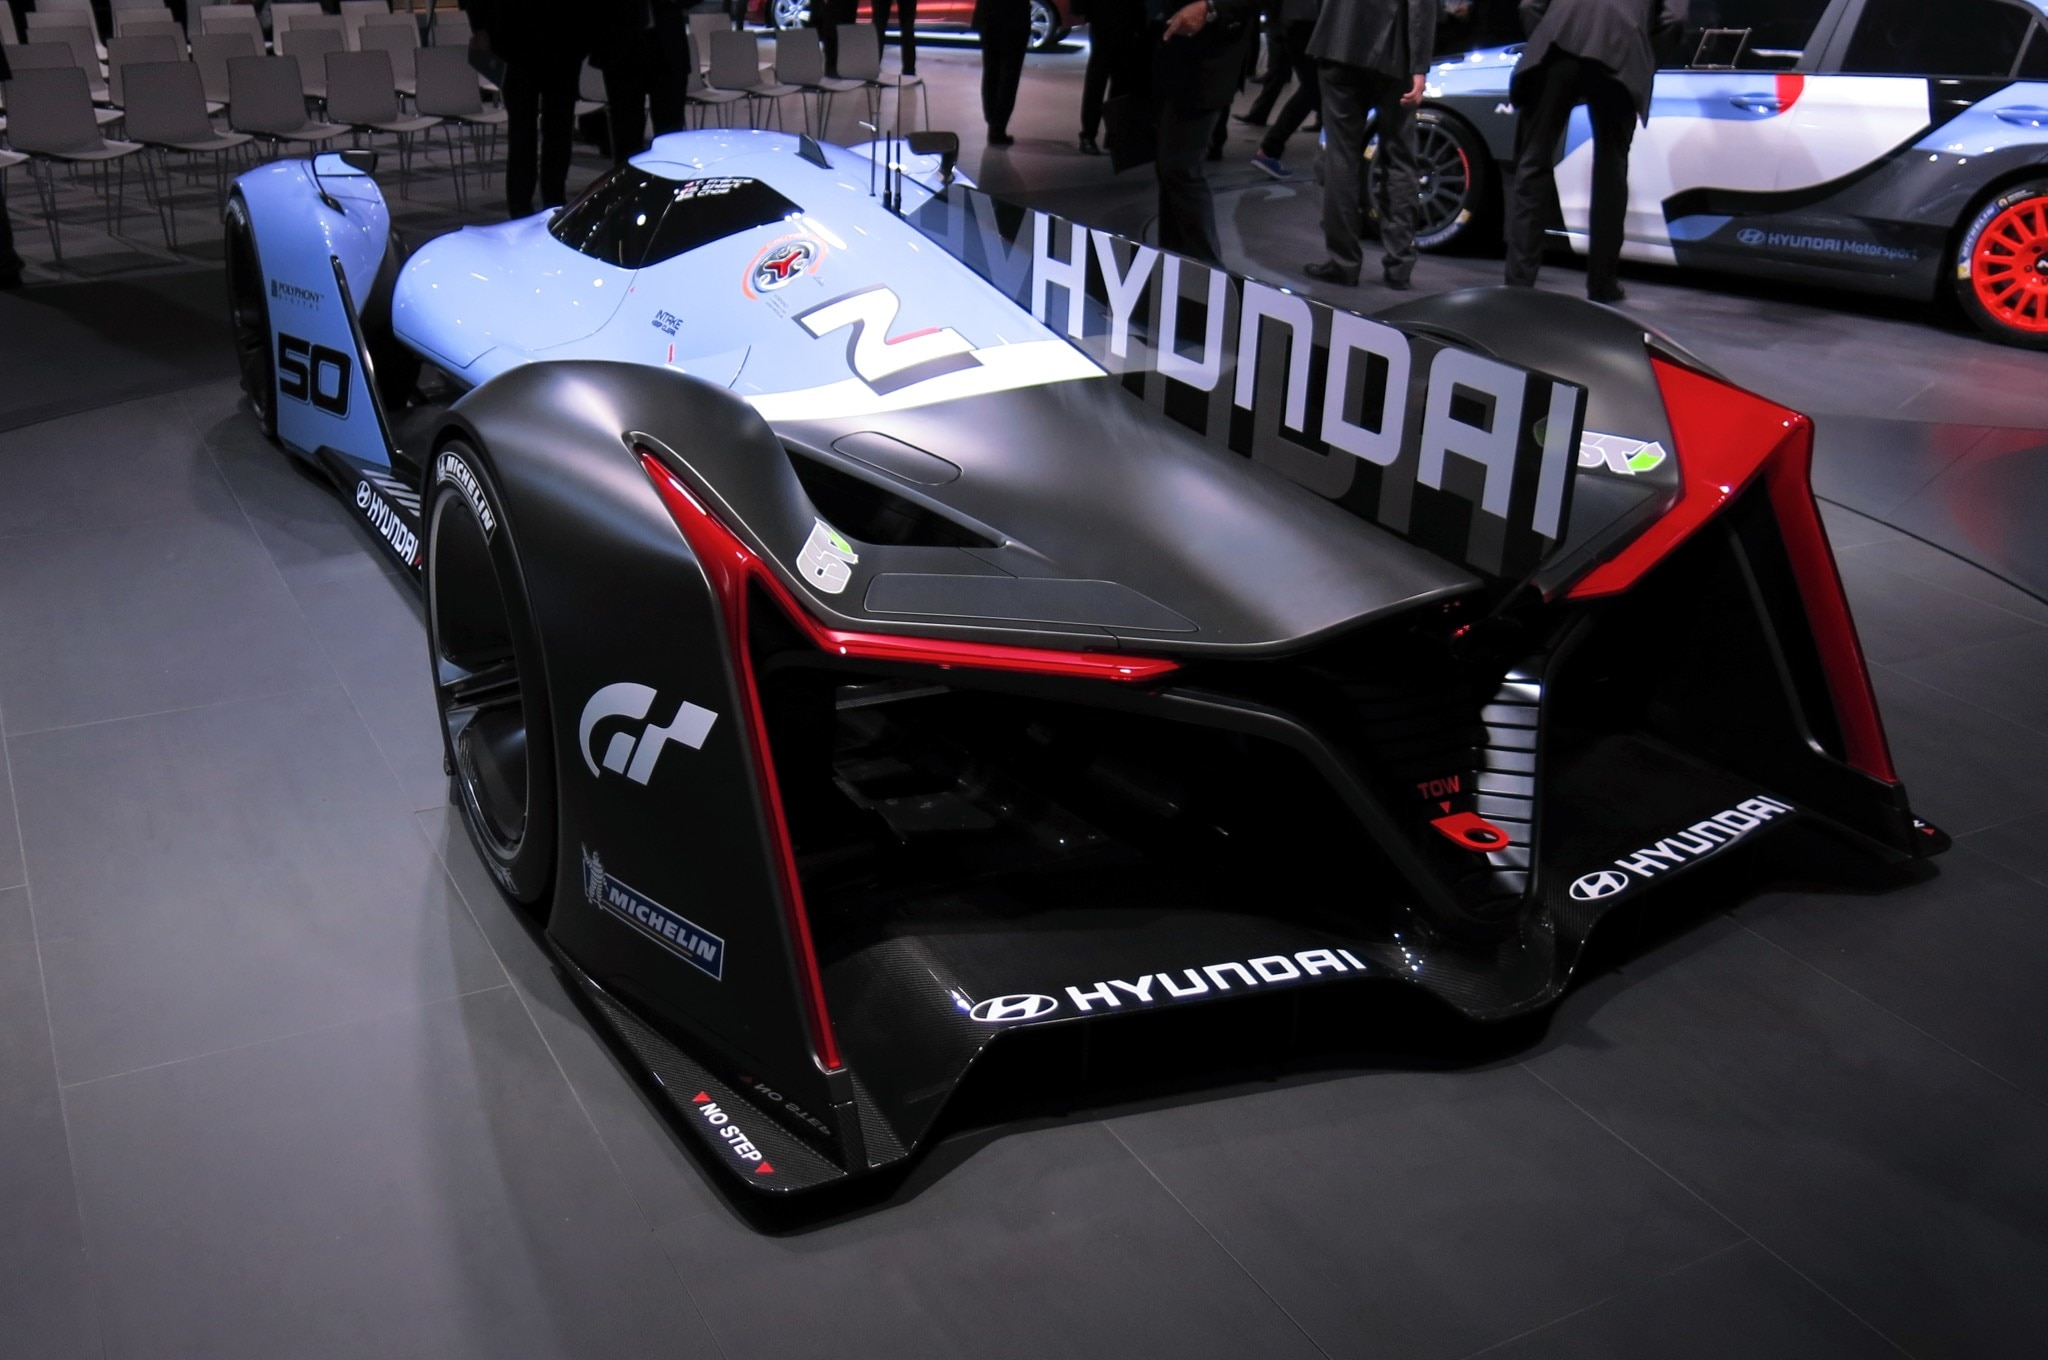 BMW Near Me >> Hyundai N 2025 Vision Gran Turismo Leads the Way for new N ...